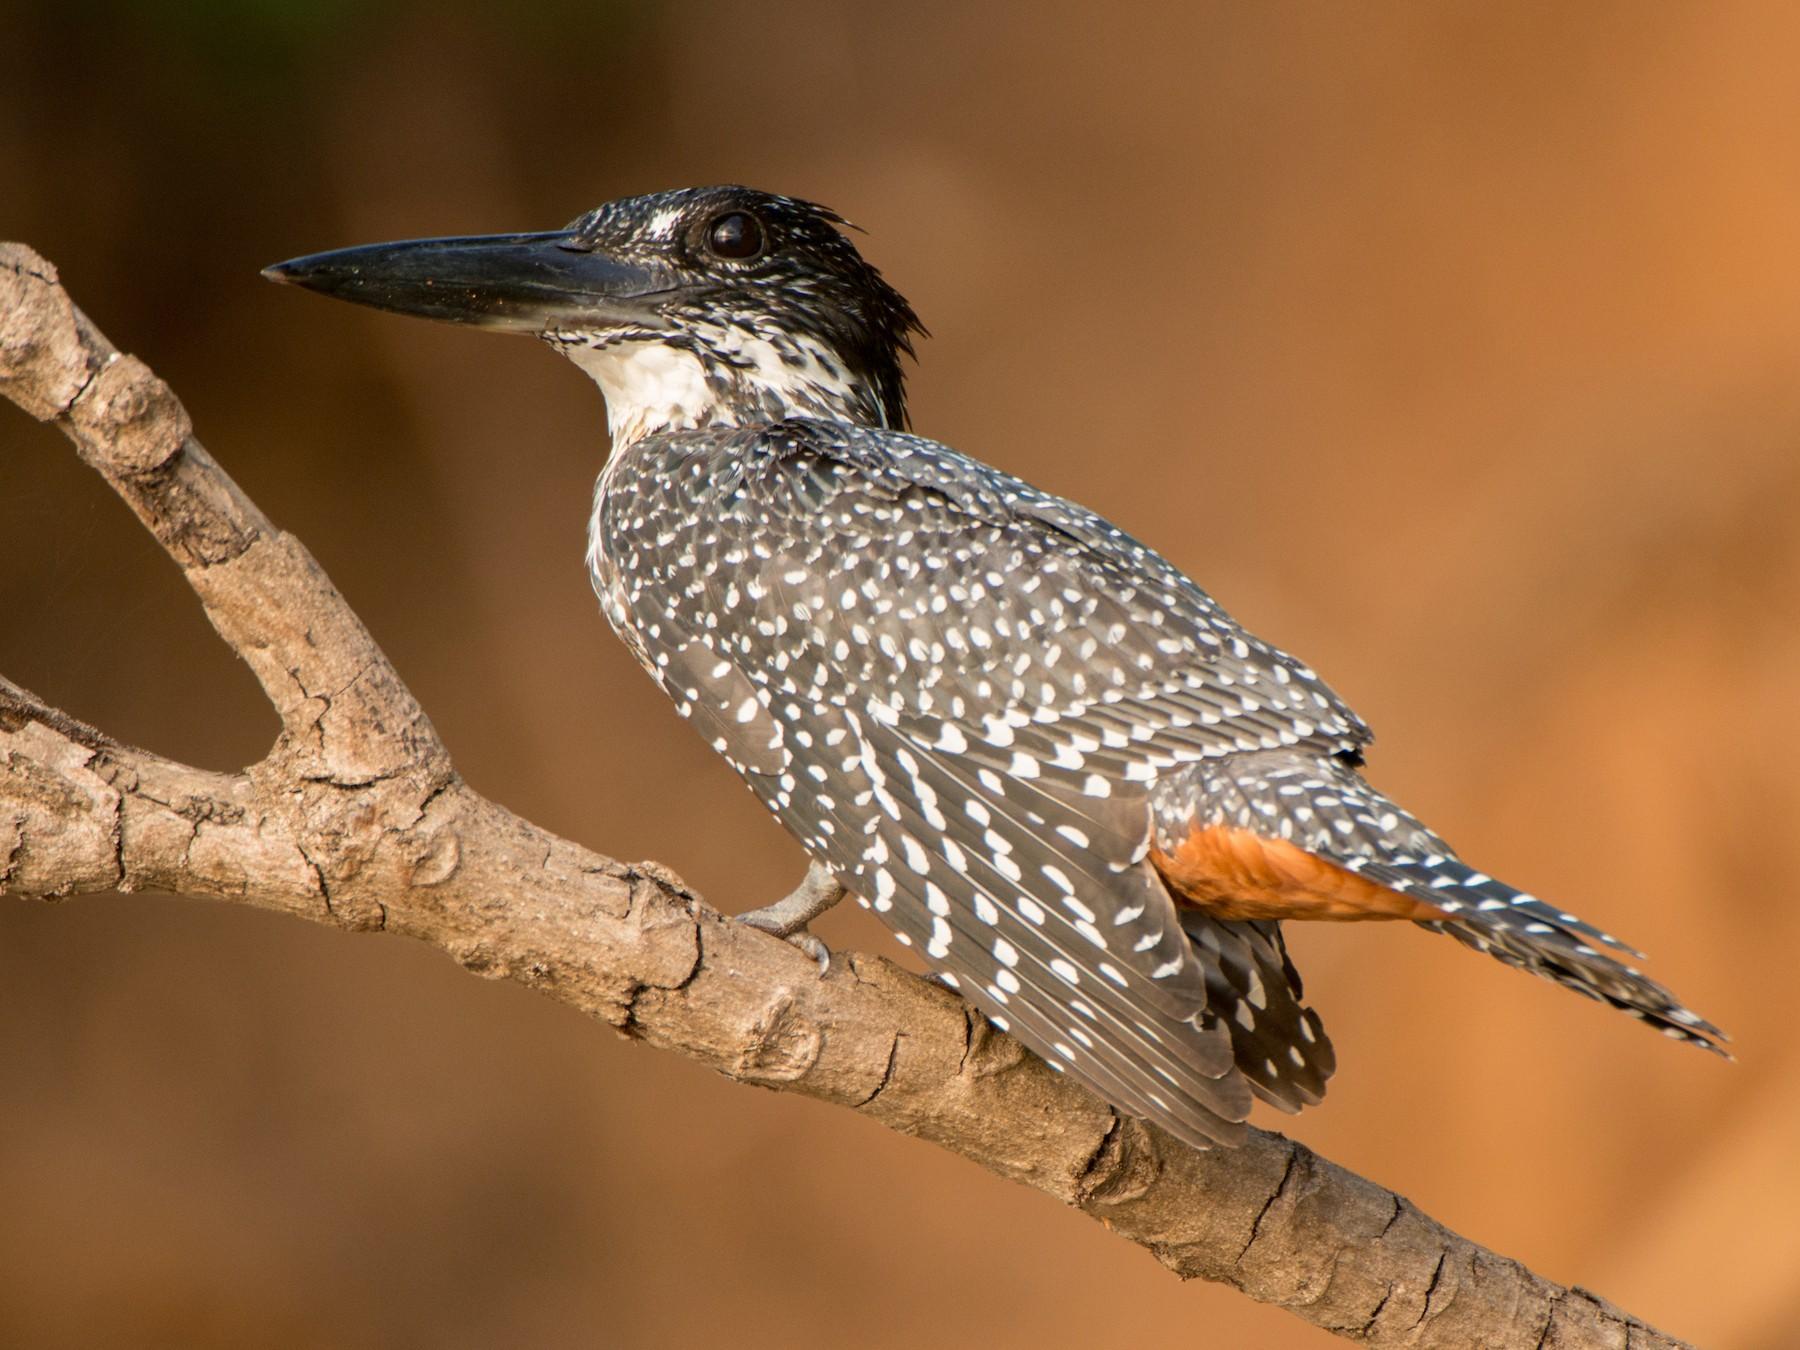 Giant Kingfisher - Eric van Poppel